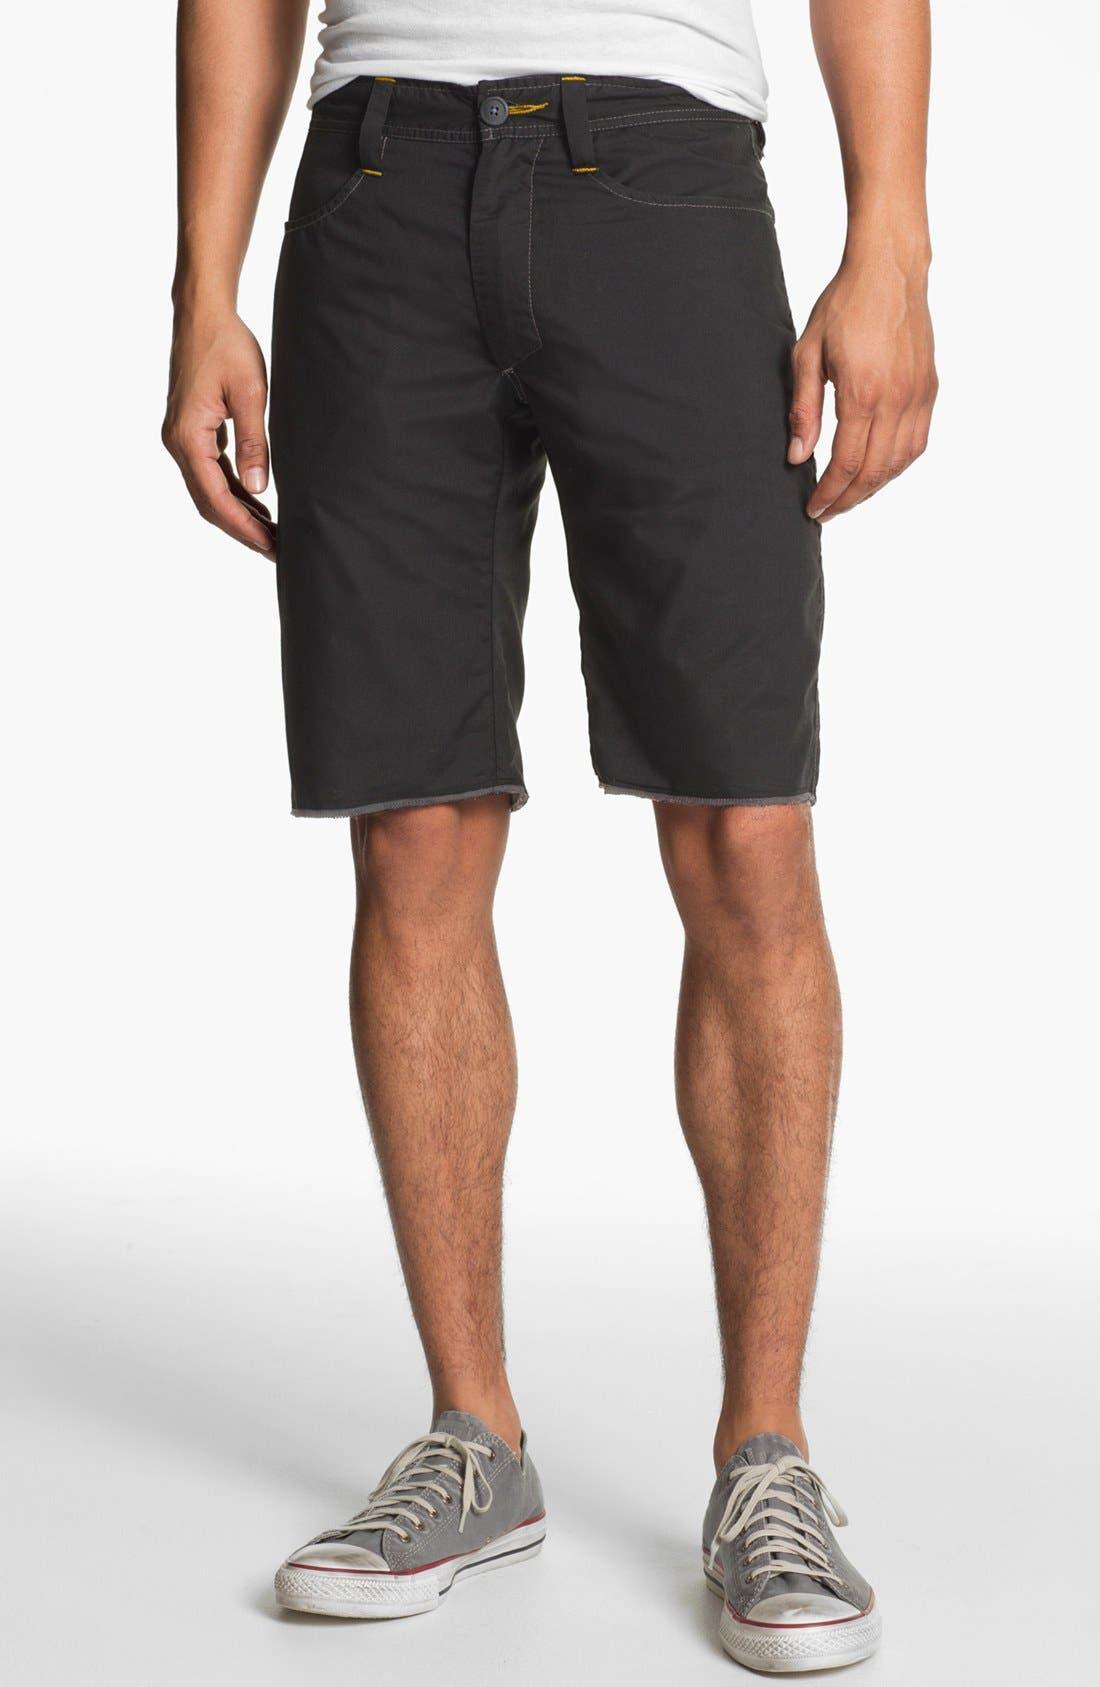 Alternate Image 1 Selected - Howe 'Hands Down' Reversible Shorts